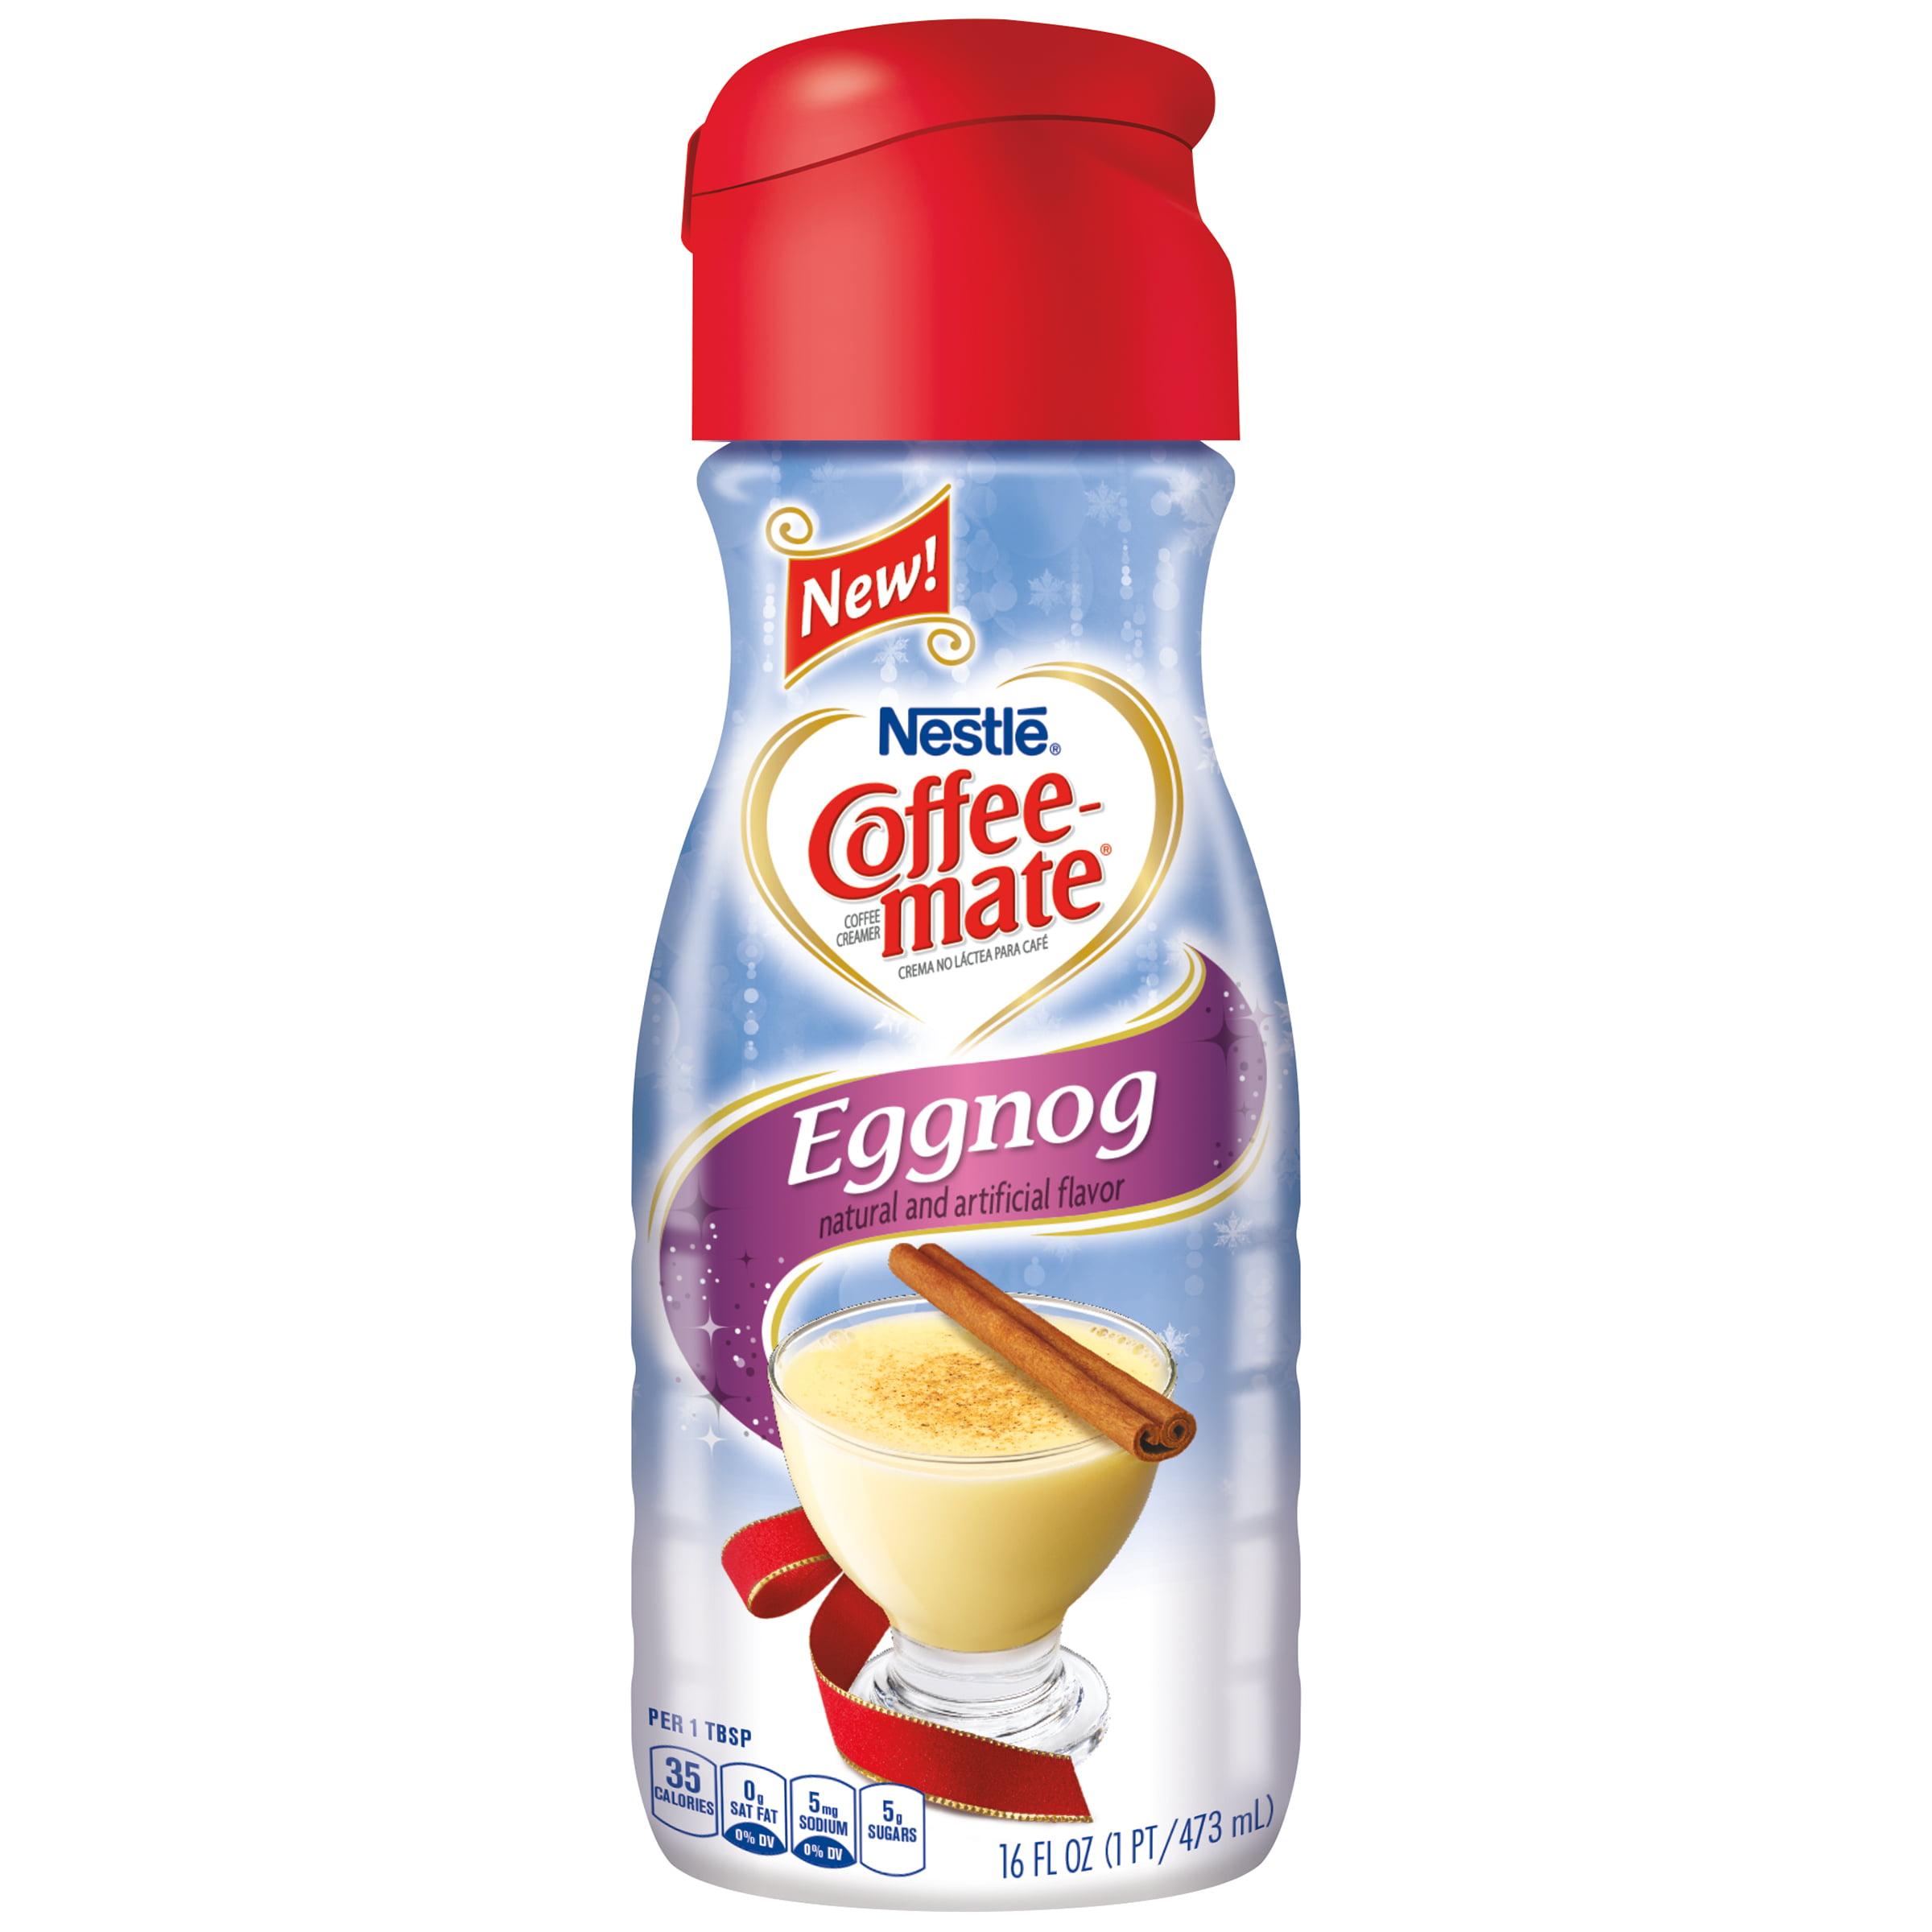 COFFEE-MATE Eggnog Liquid Coffee Creamer 16 fl. oz. Bottle -..